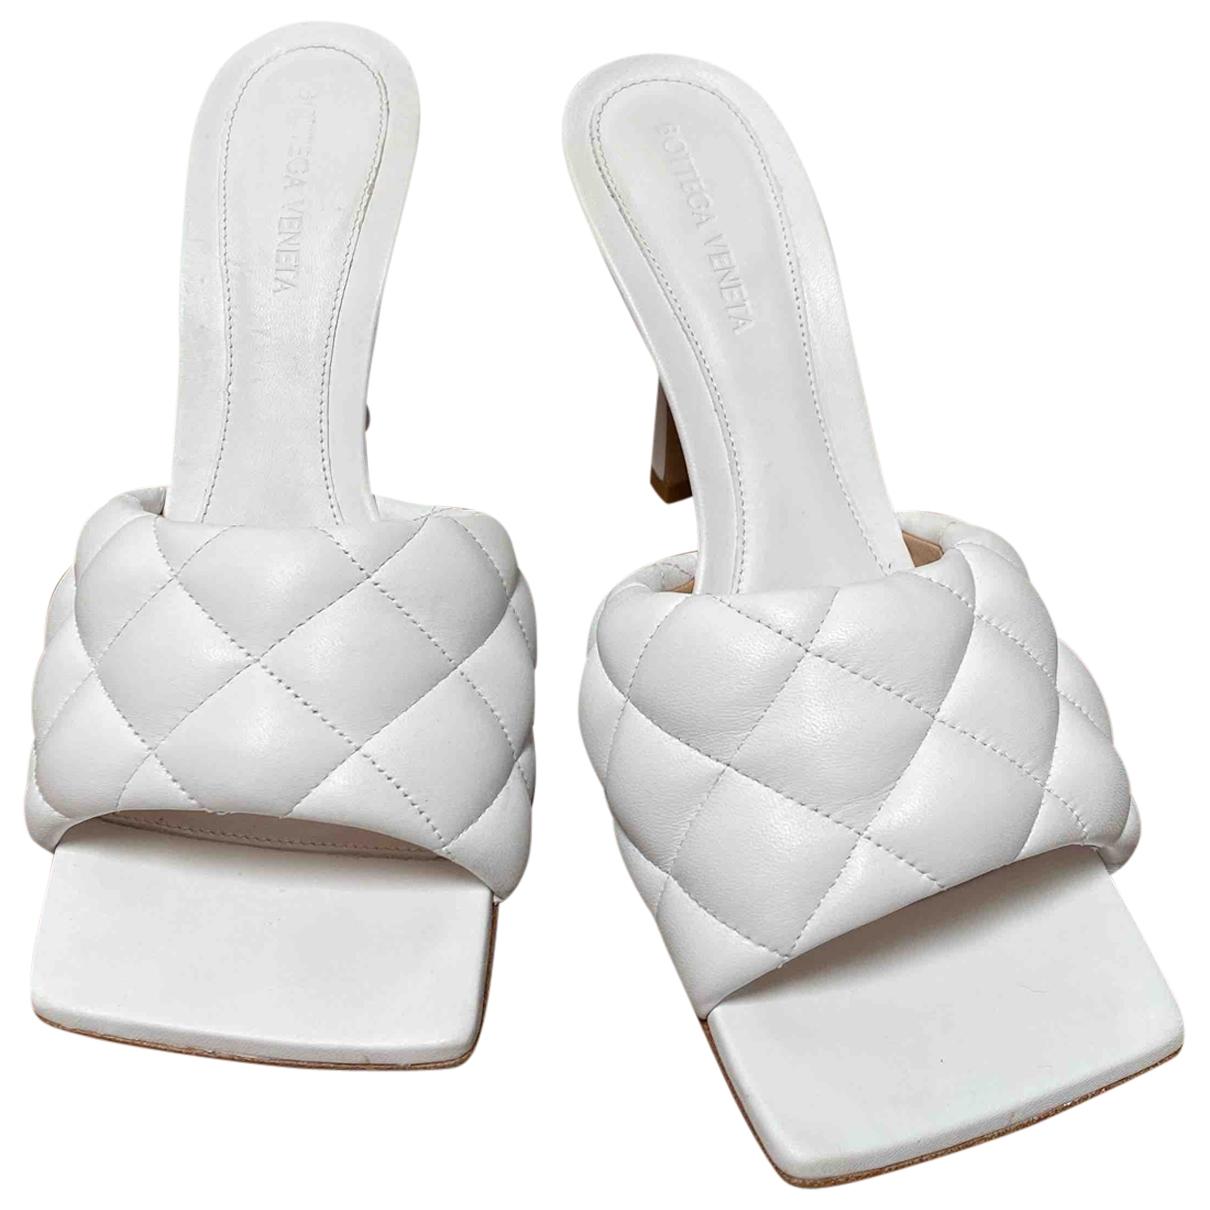 Bottega Veneta Bloc White Leather Sandals for Women 39.5 EU